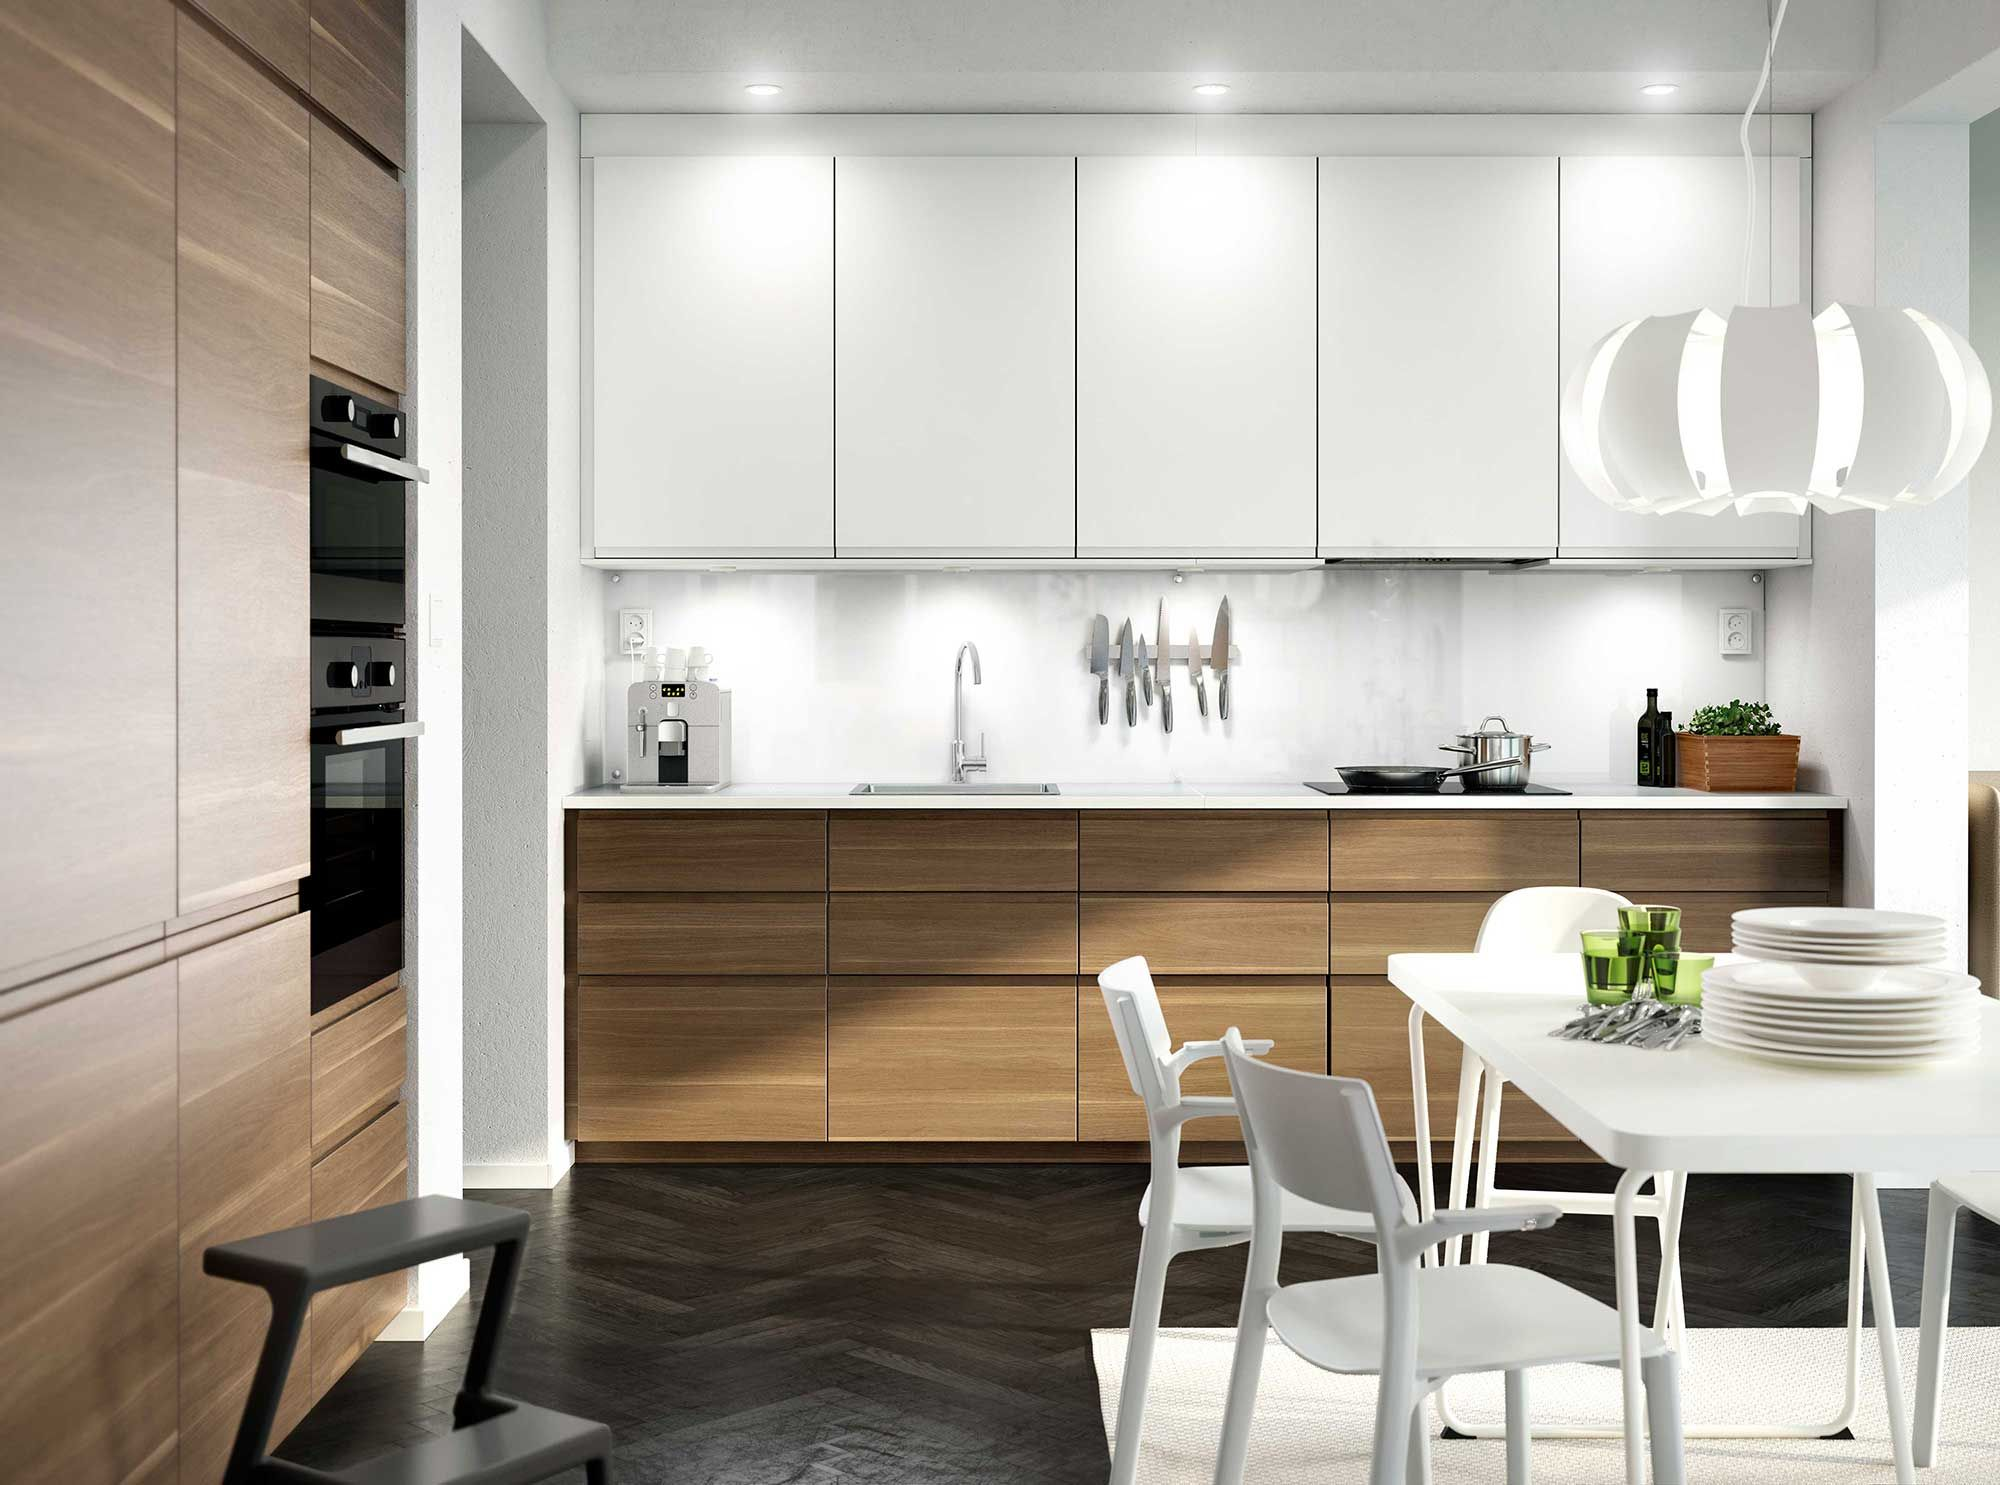 IKEA Metod | Kitchen | Pinterest | Cocina ikea, Ikea y Cocinas